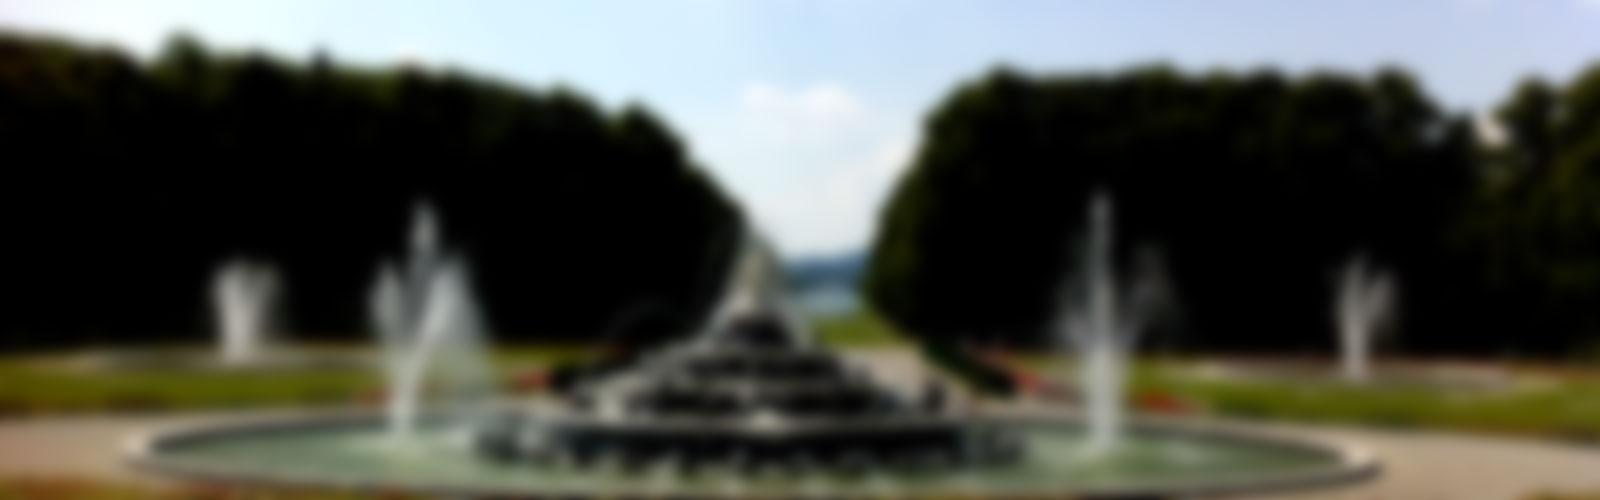 Herreninsel Chiemsee e l'inattesa scoperta della Versailles bavarese